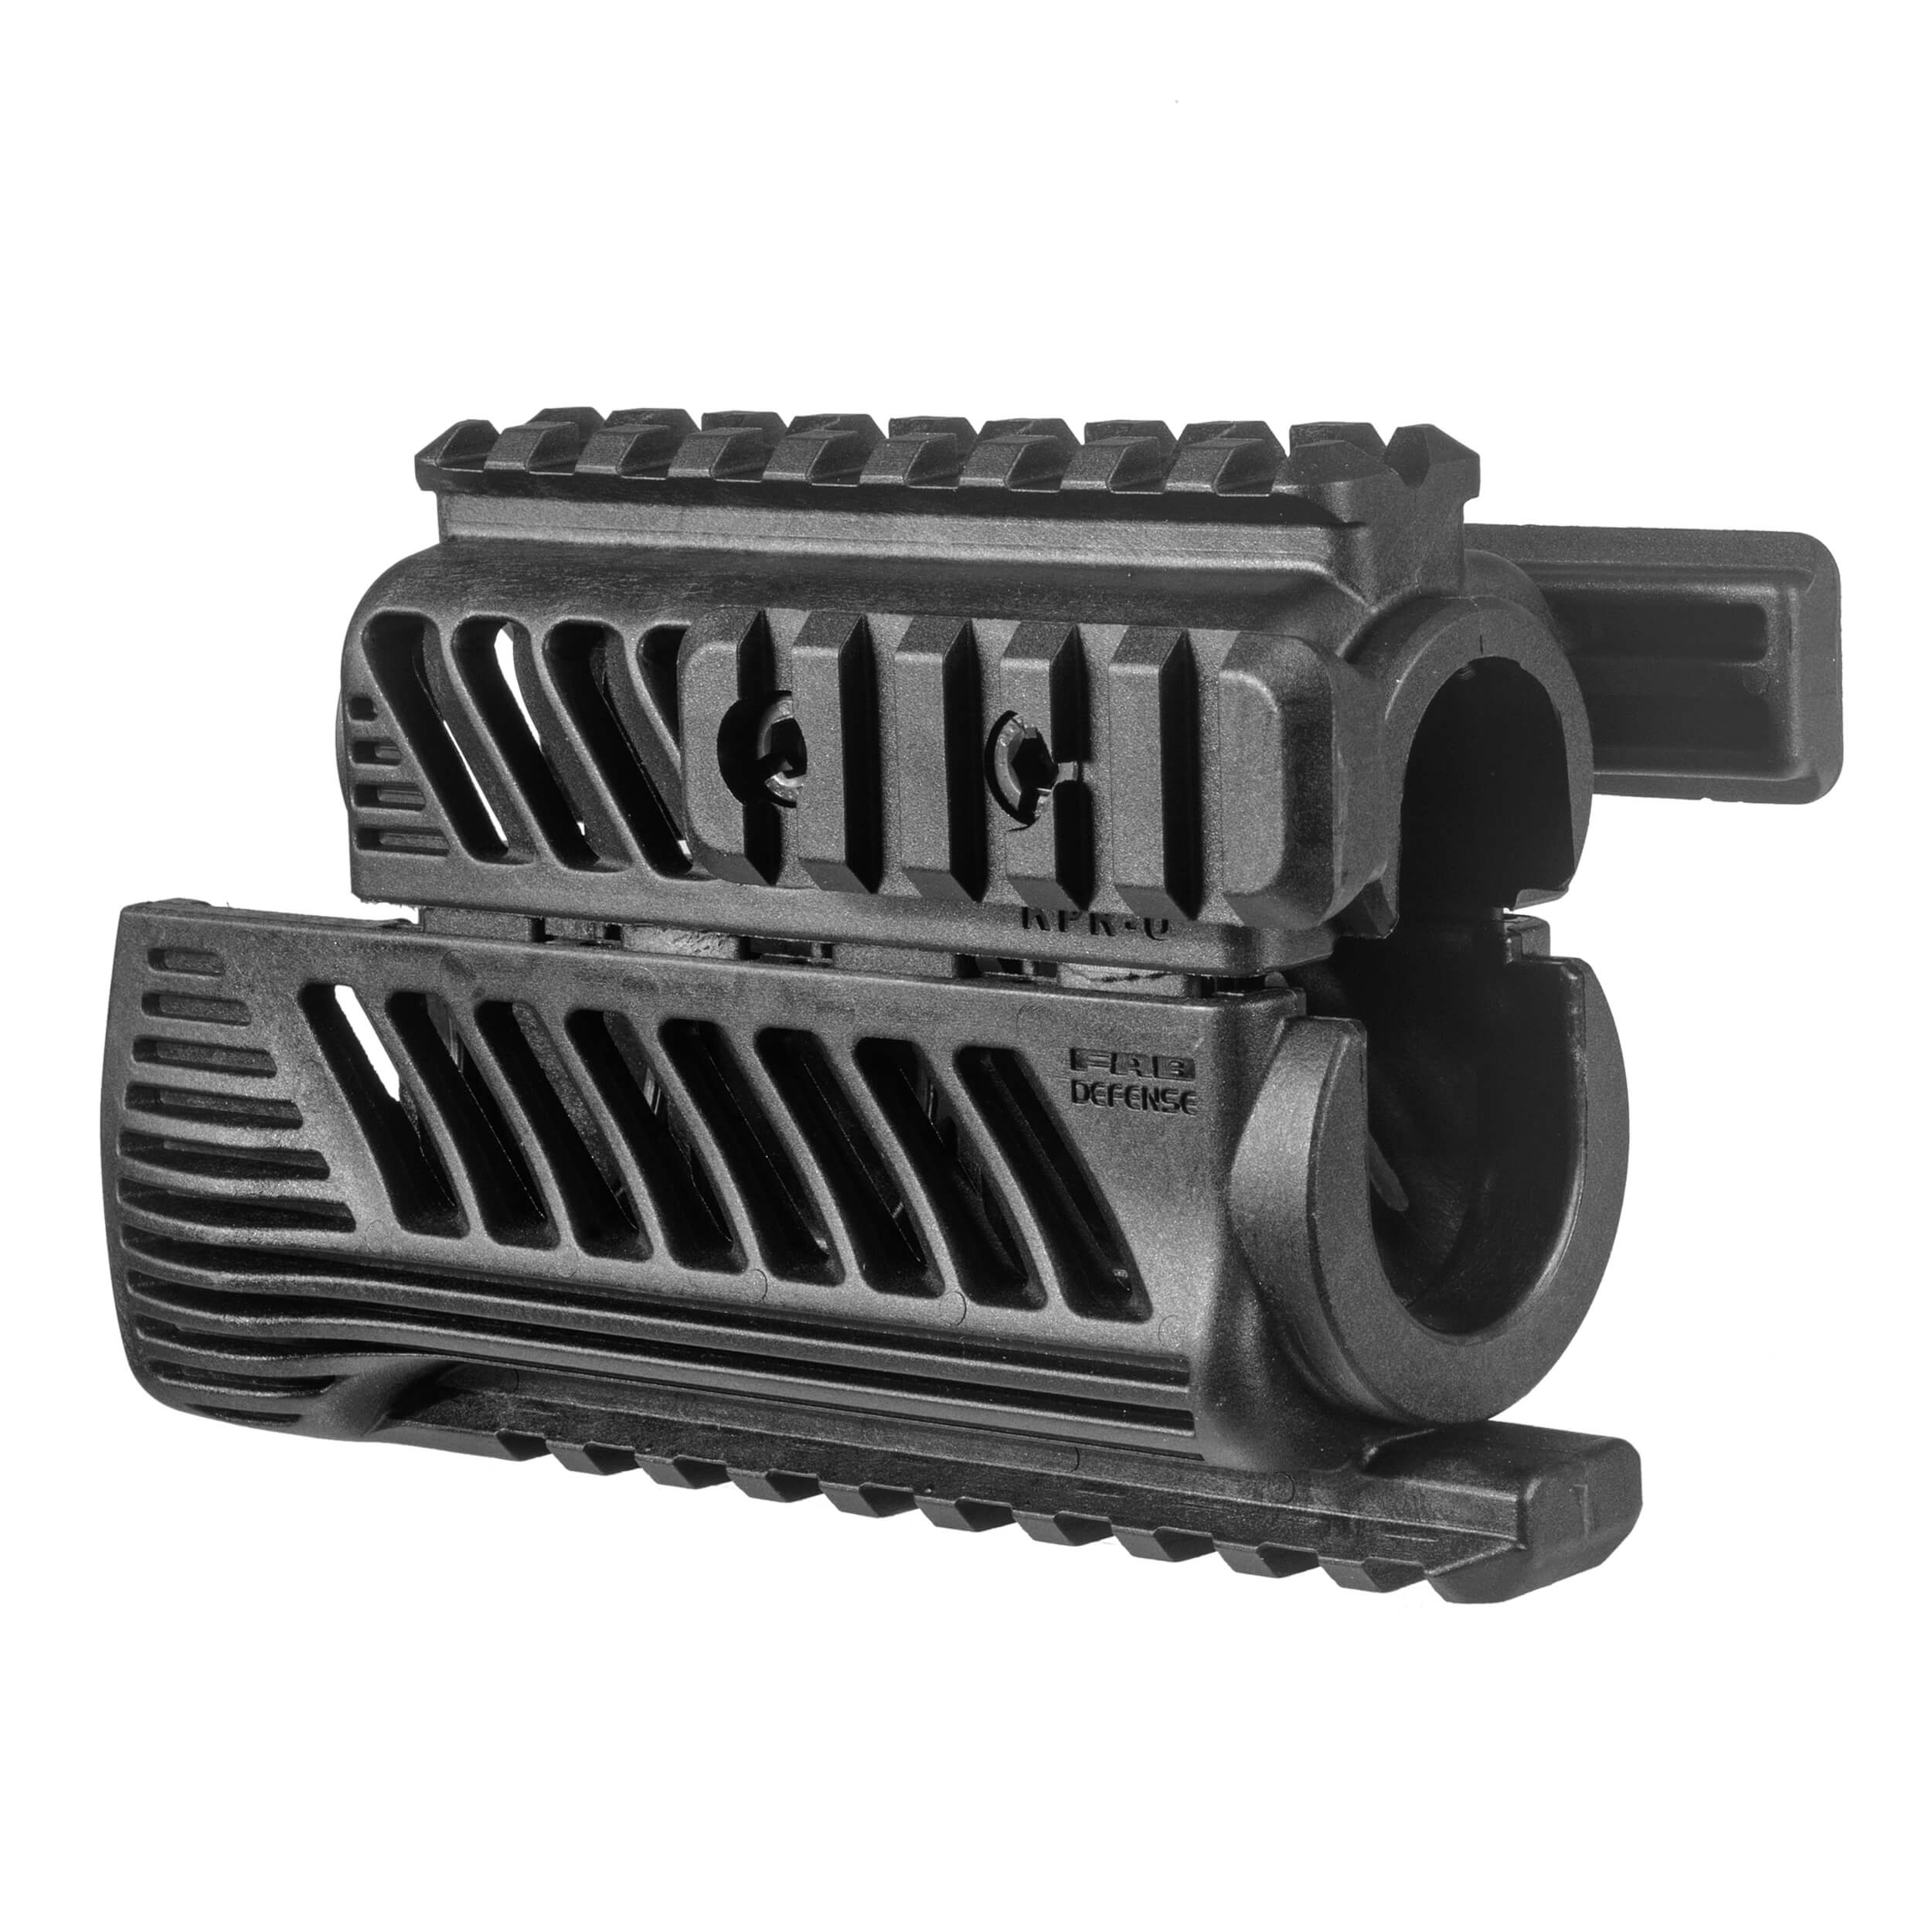 AKS-74U Quad Rail Polymer Handguard